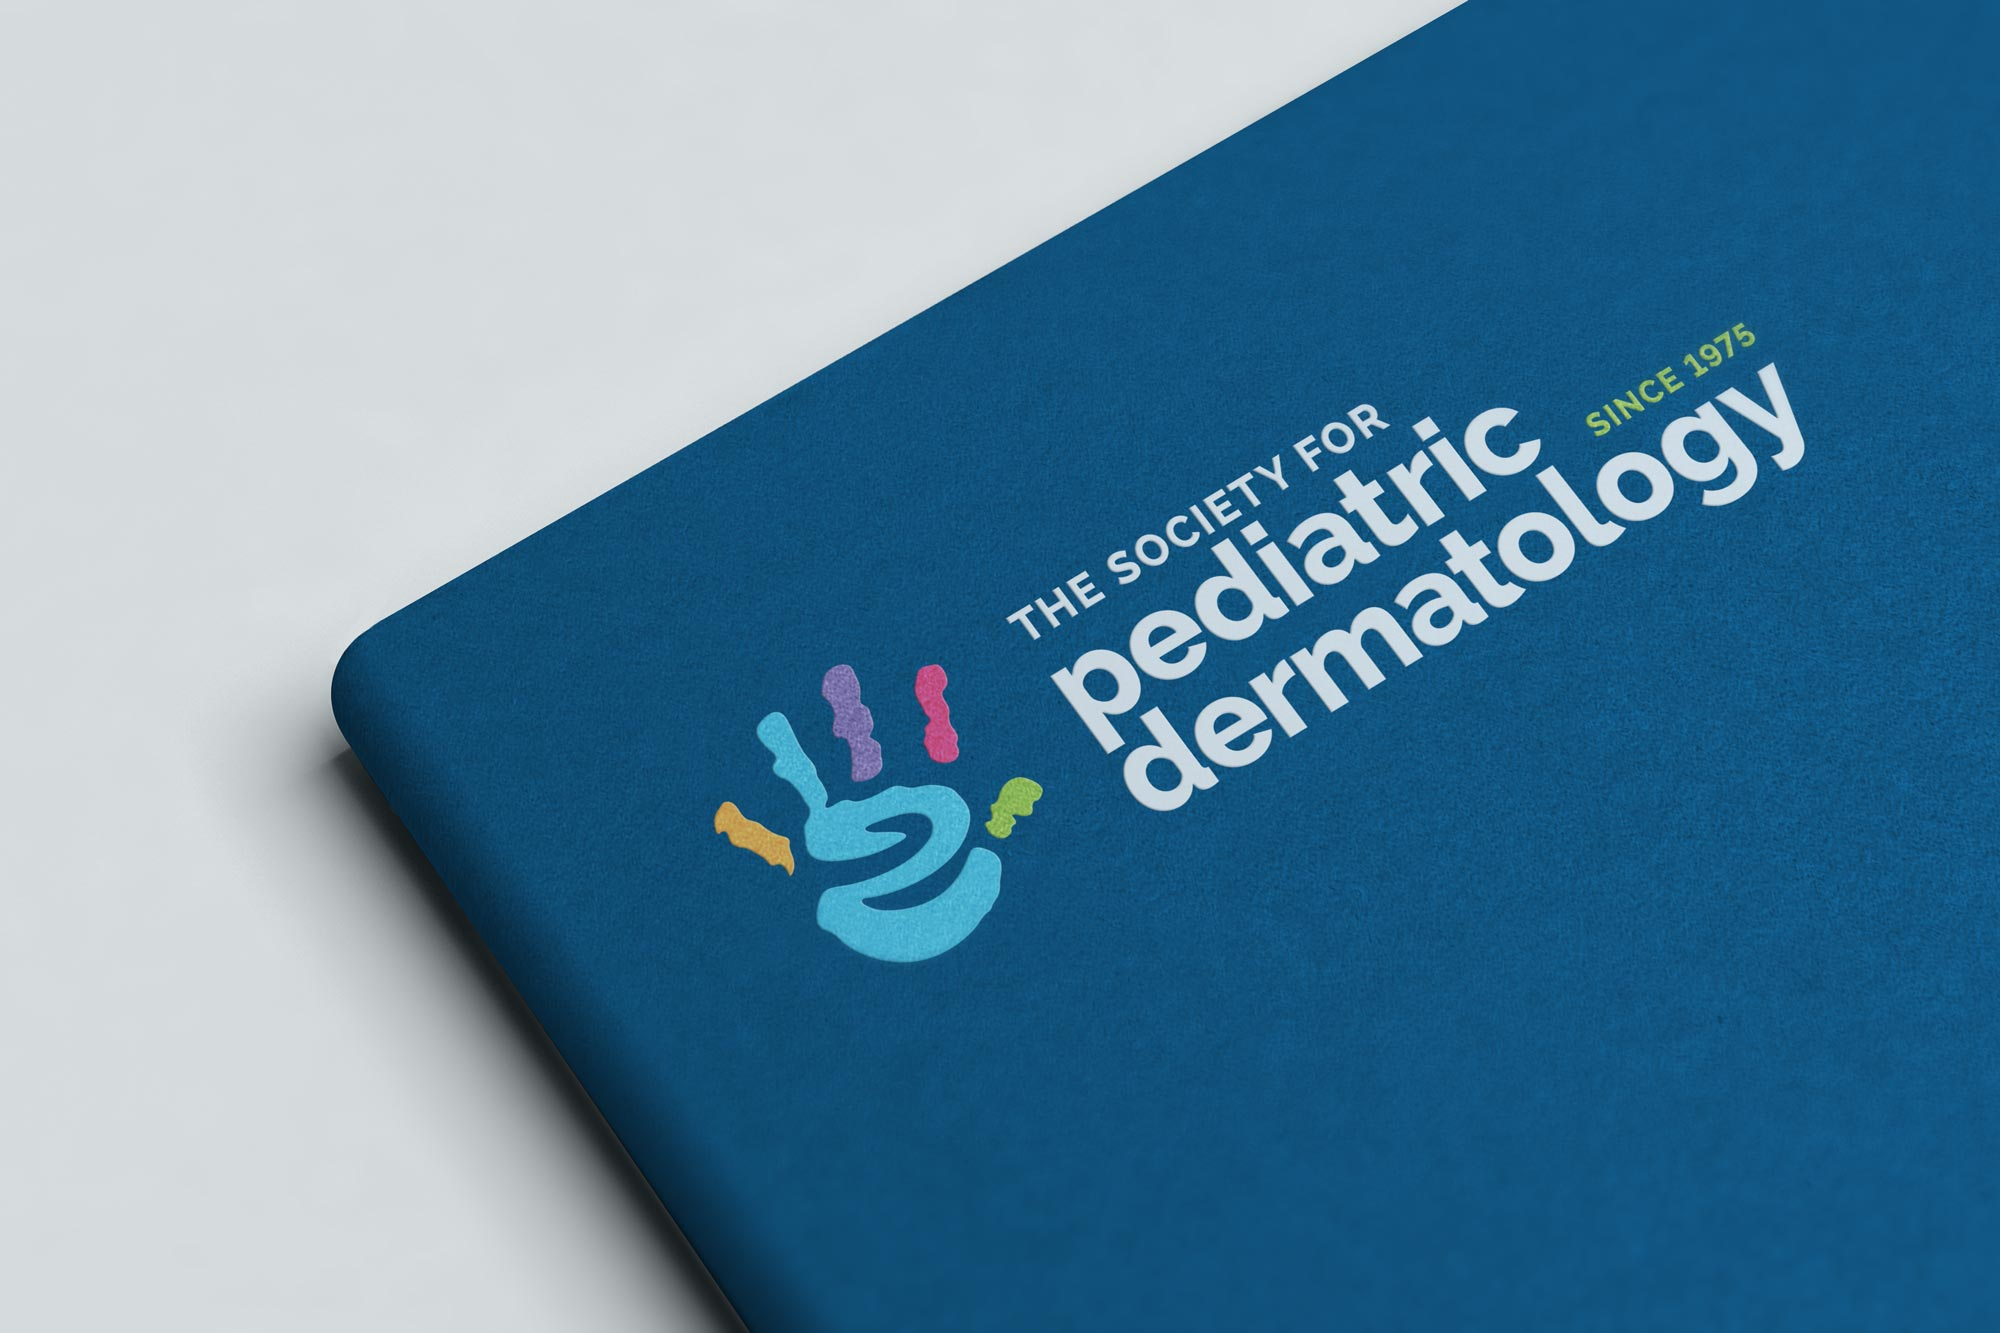 SPD logo on notebook